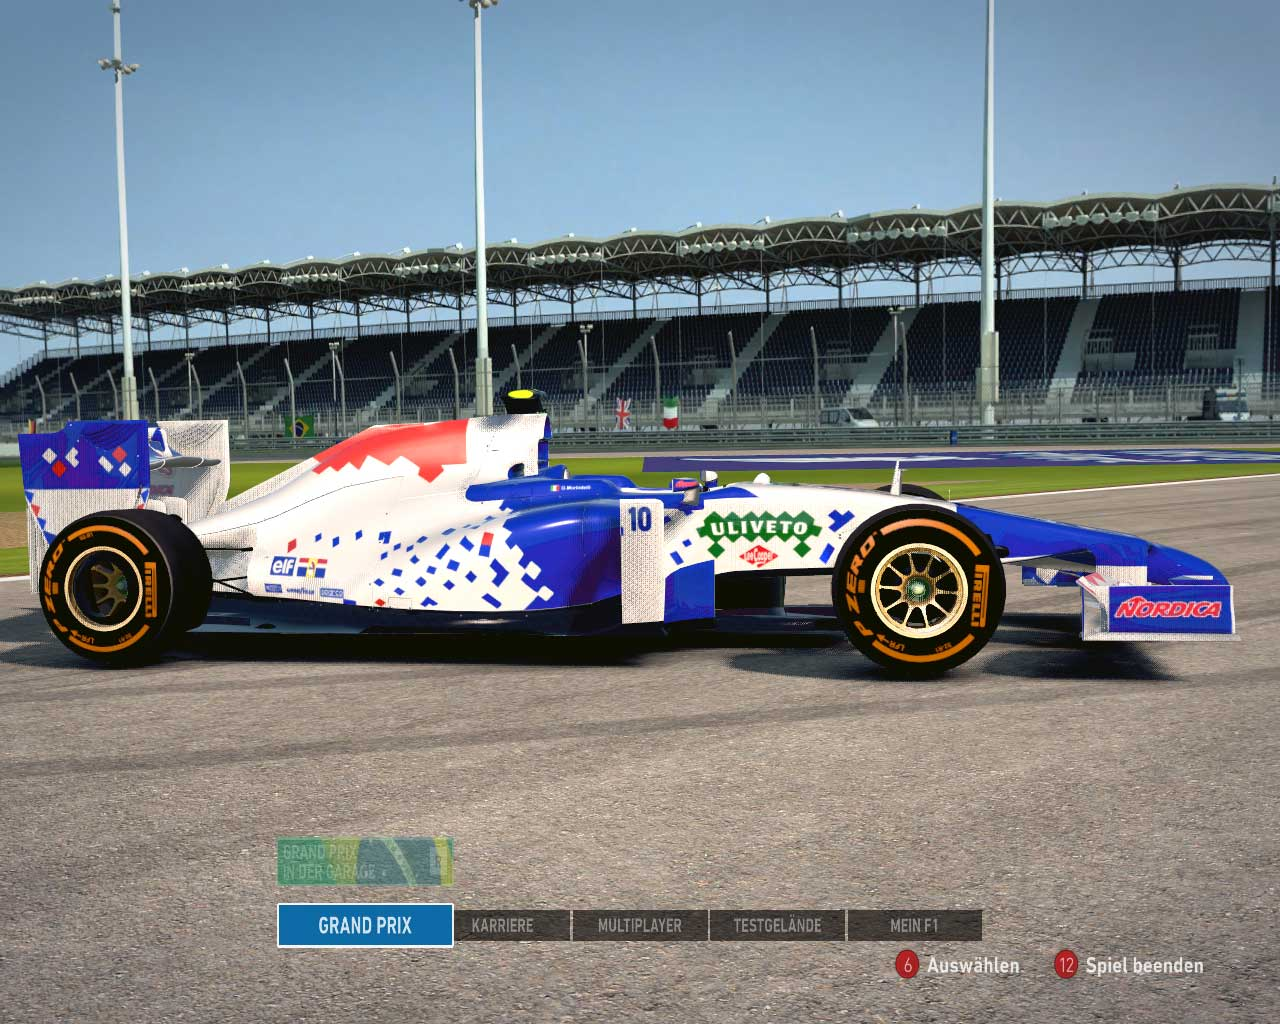 F1 2014 Footwork Team 1994 v1.0